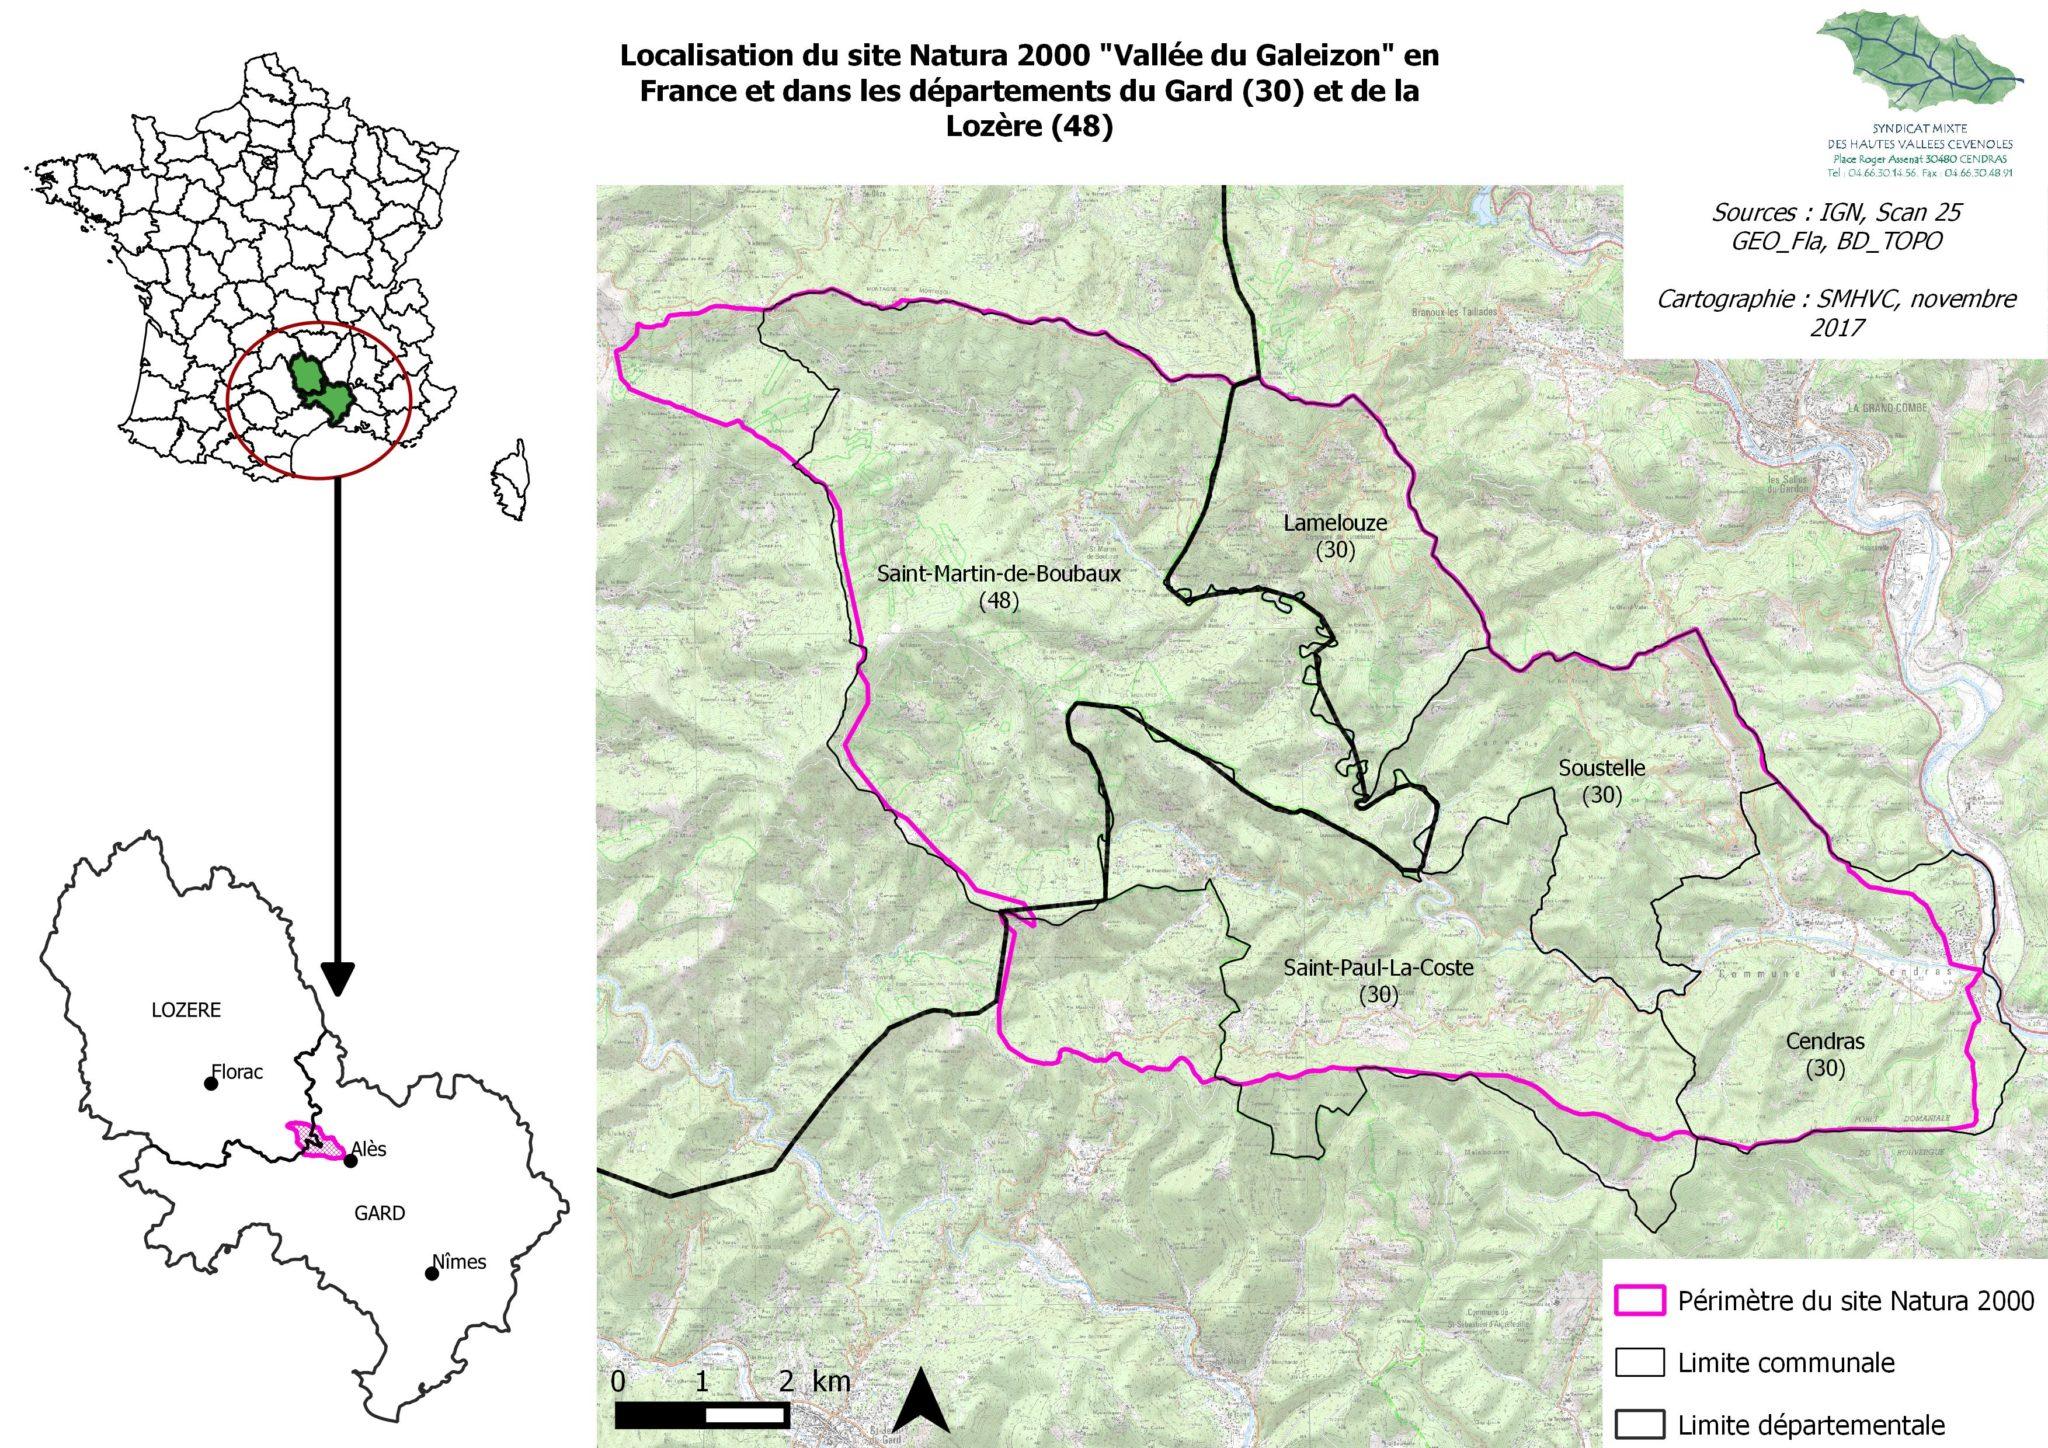 carte_localisation_siteN2000